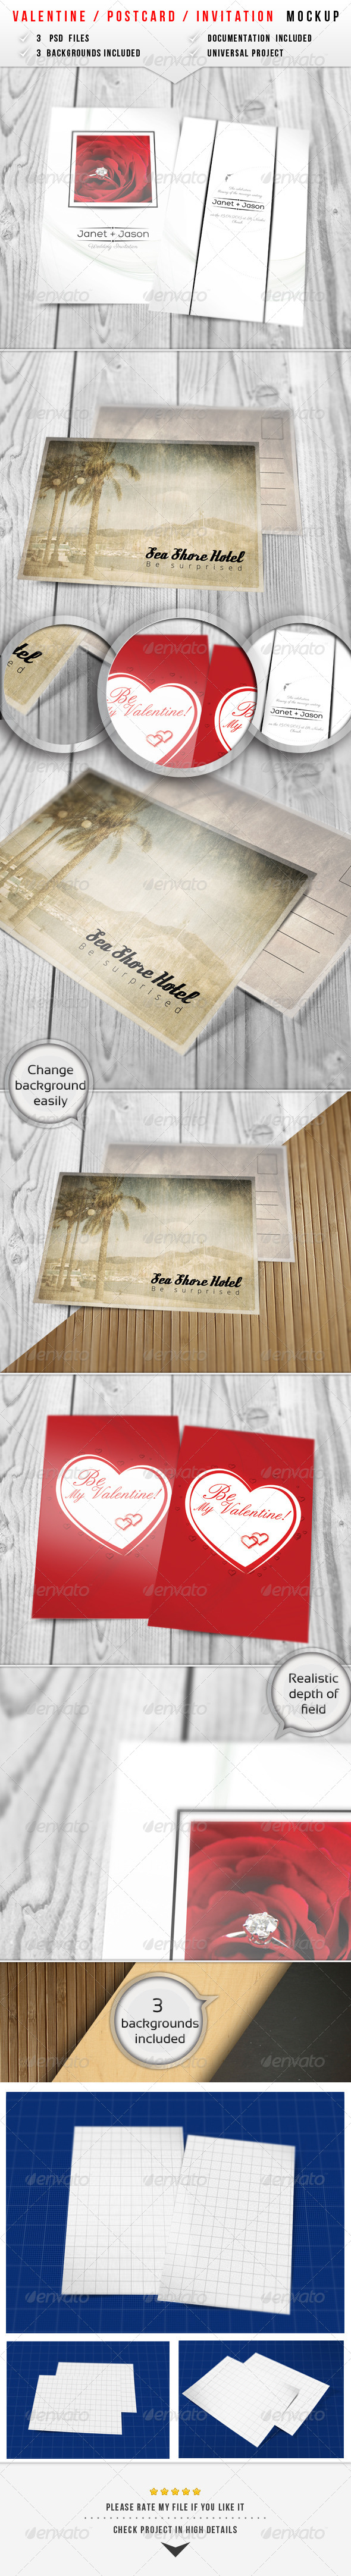 GraphicRiver Valentine Invitation Mockup 2 6481688